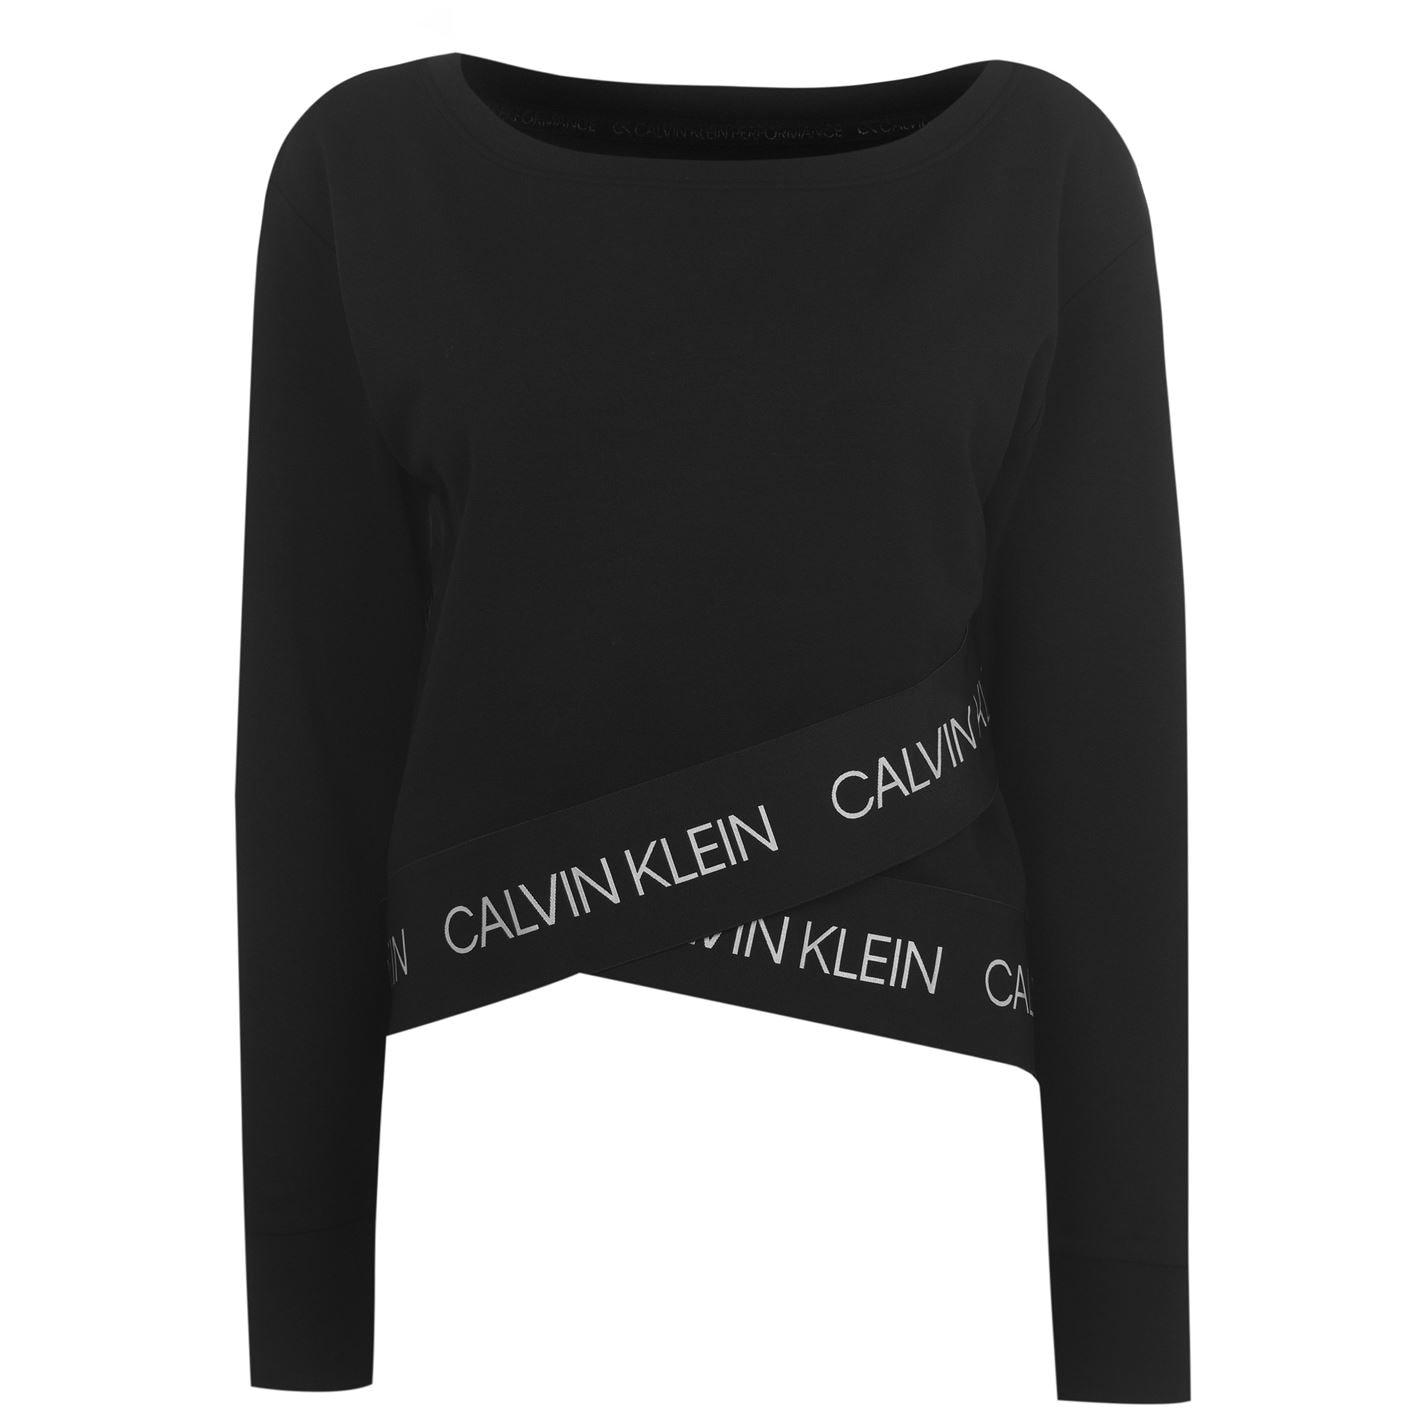 Mergi la Bluza de trening Pulovere Calvin Klein Performance Boatneck ck negru